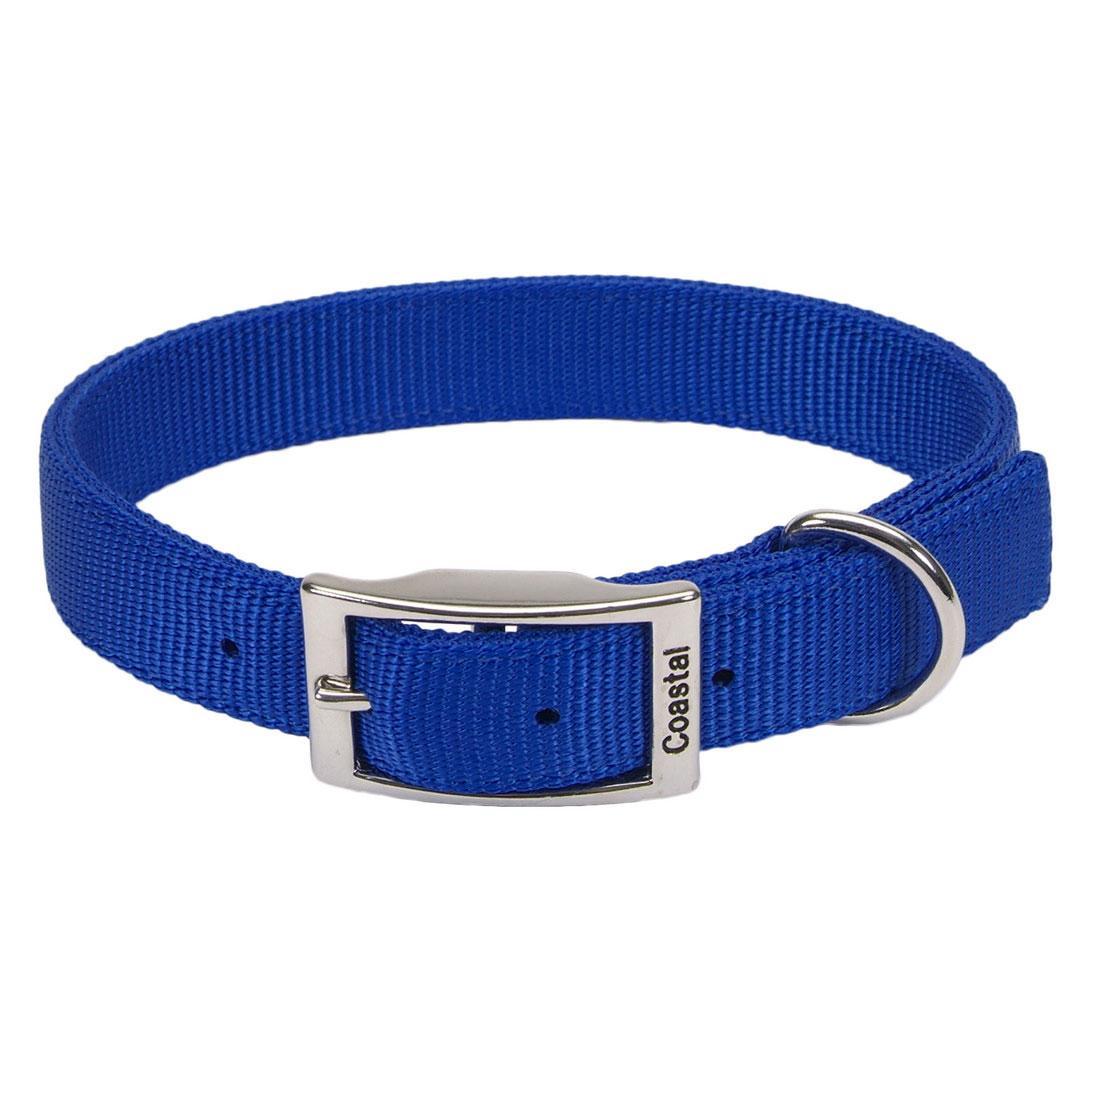 Coastal Double-Ply Nylon Dog Collar, Blue, 1-in x 26-in